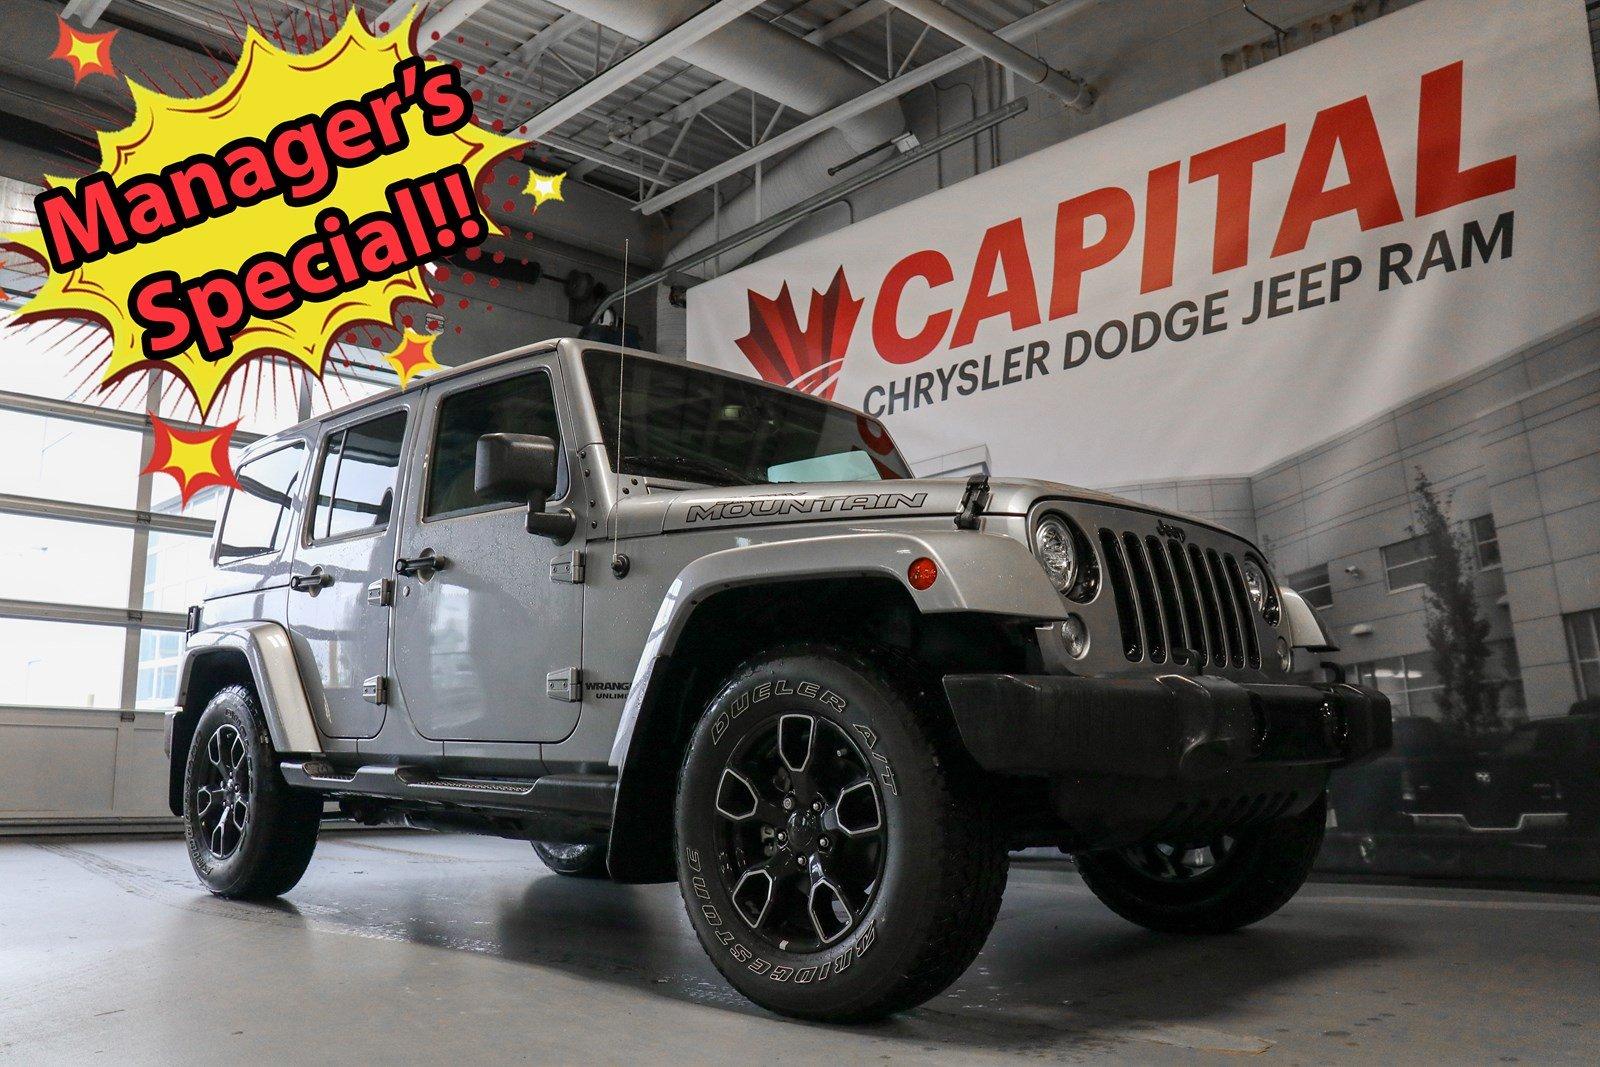 2017 Jeep Wrangler Unlimited Smoky Mountain | GPS Navigation | Hood Decals | SUV